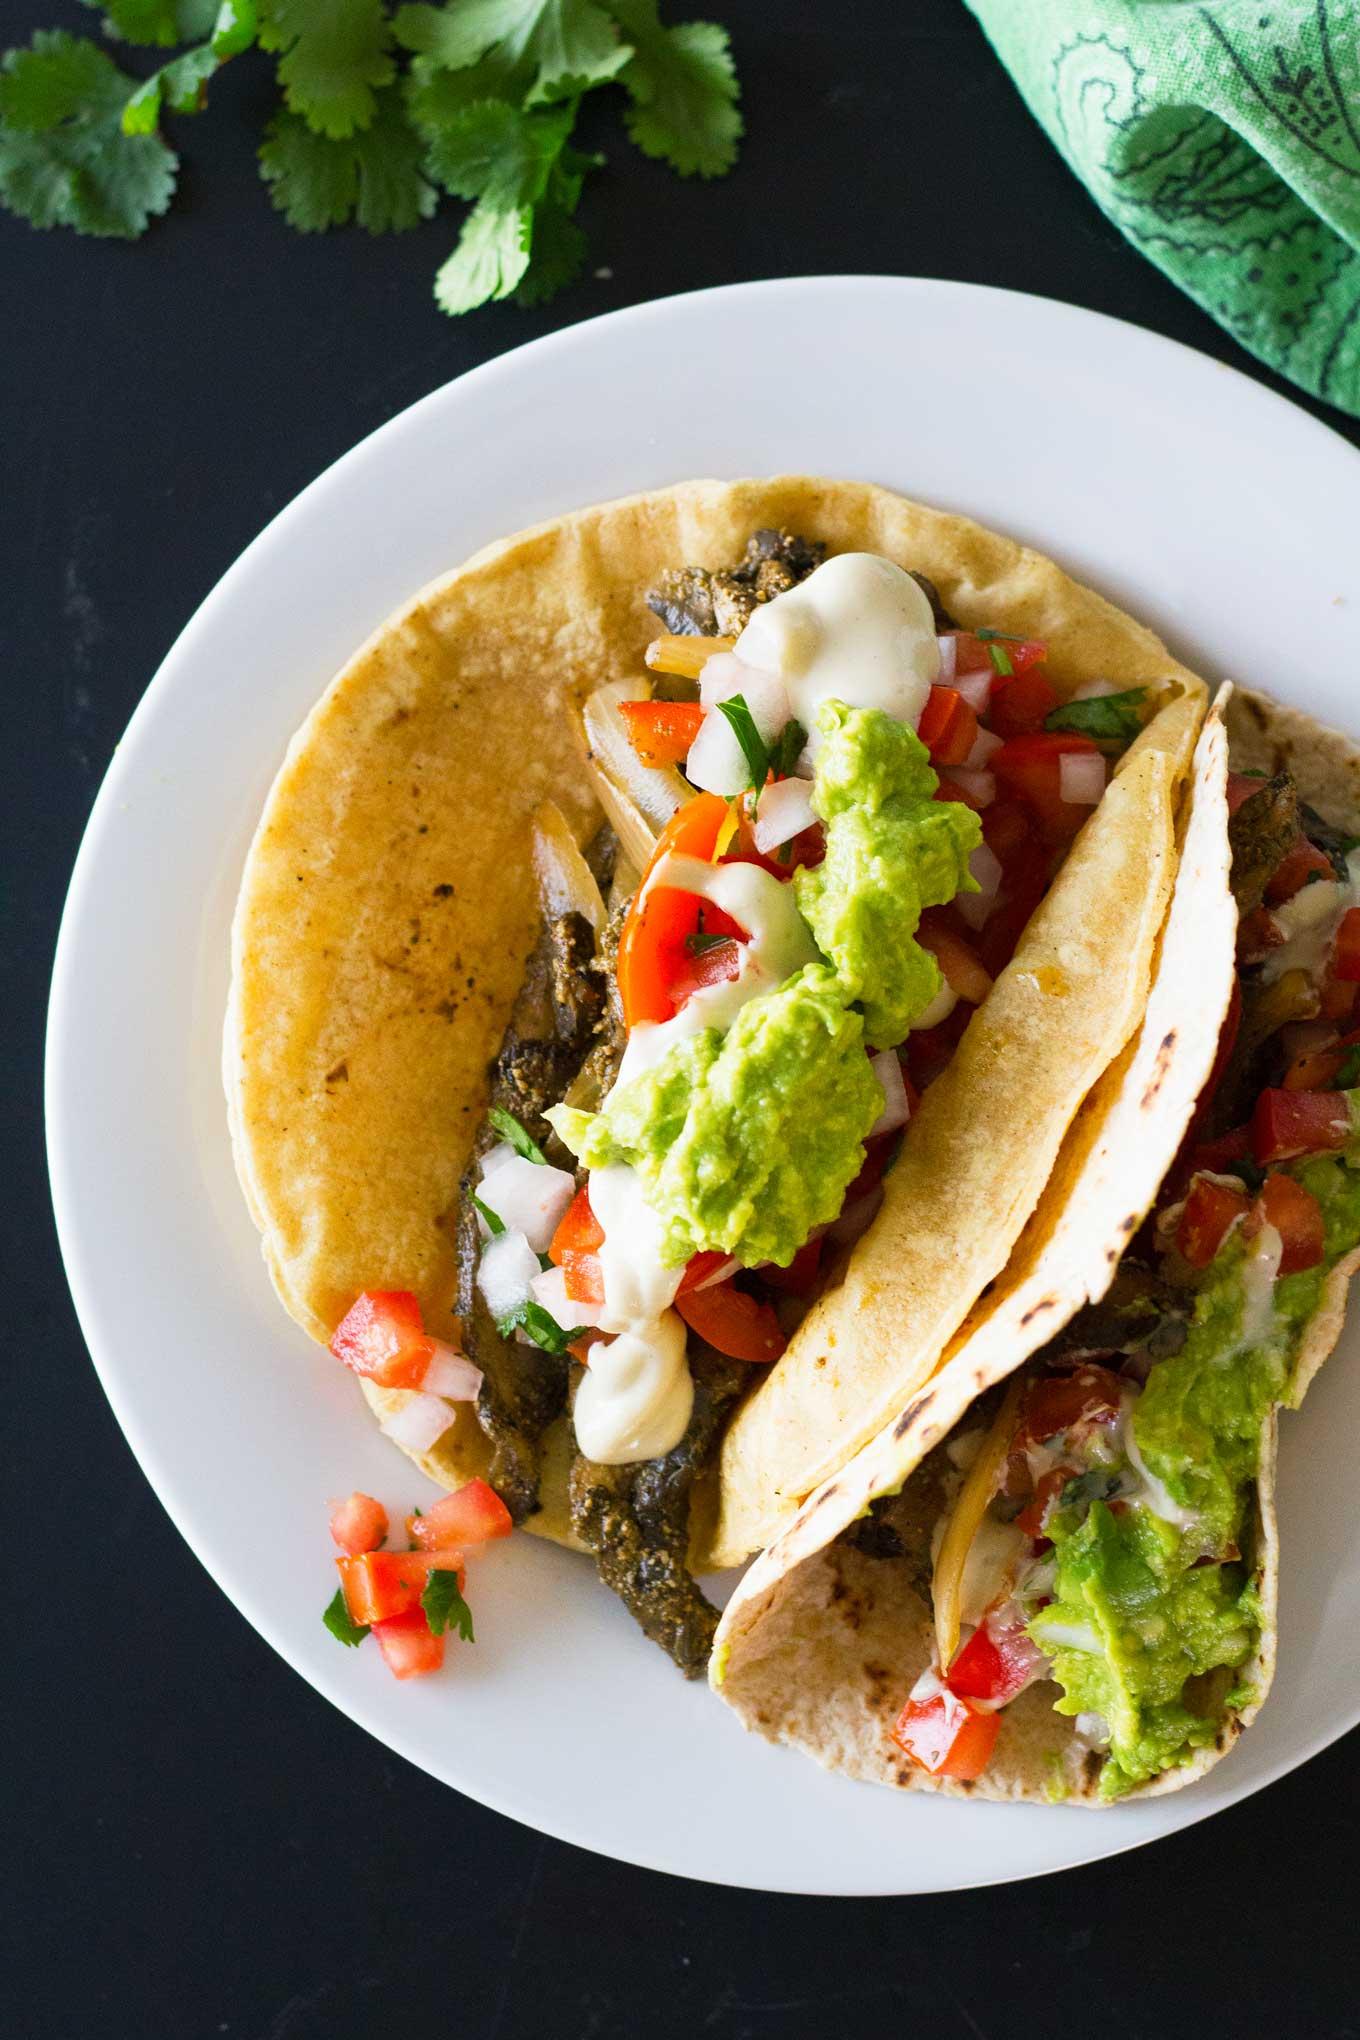 Ultimate Vegan Fajitas | Assembled fajitas on a plate topped with guacamole, pico de gallo, savory cashew cream | https://eatwithinyourmeans.com/